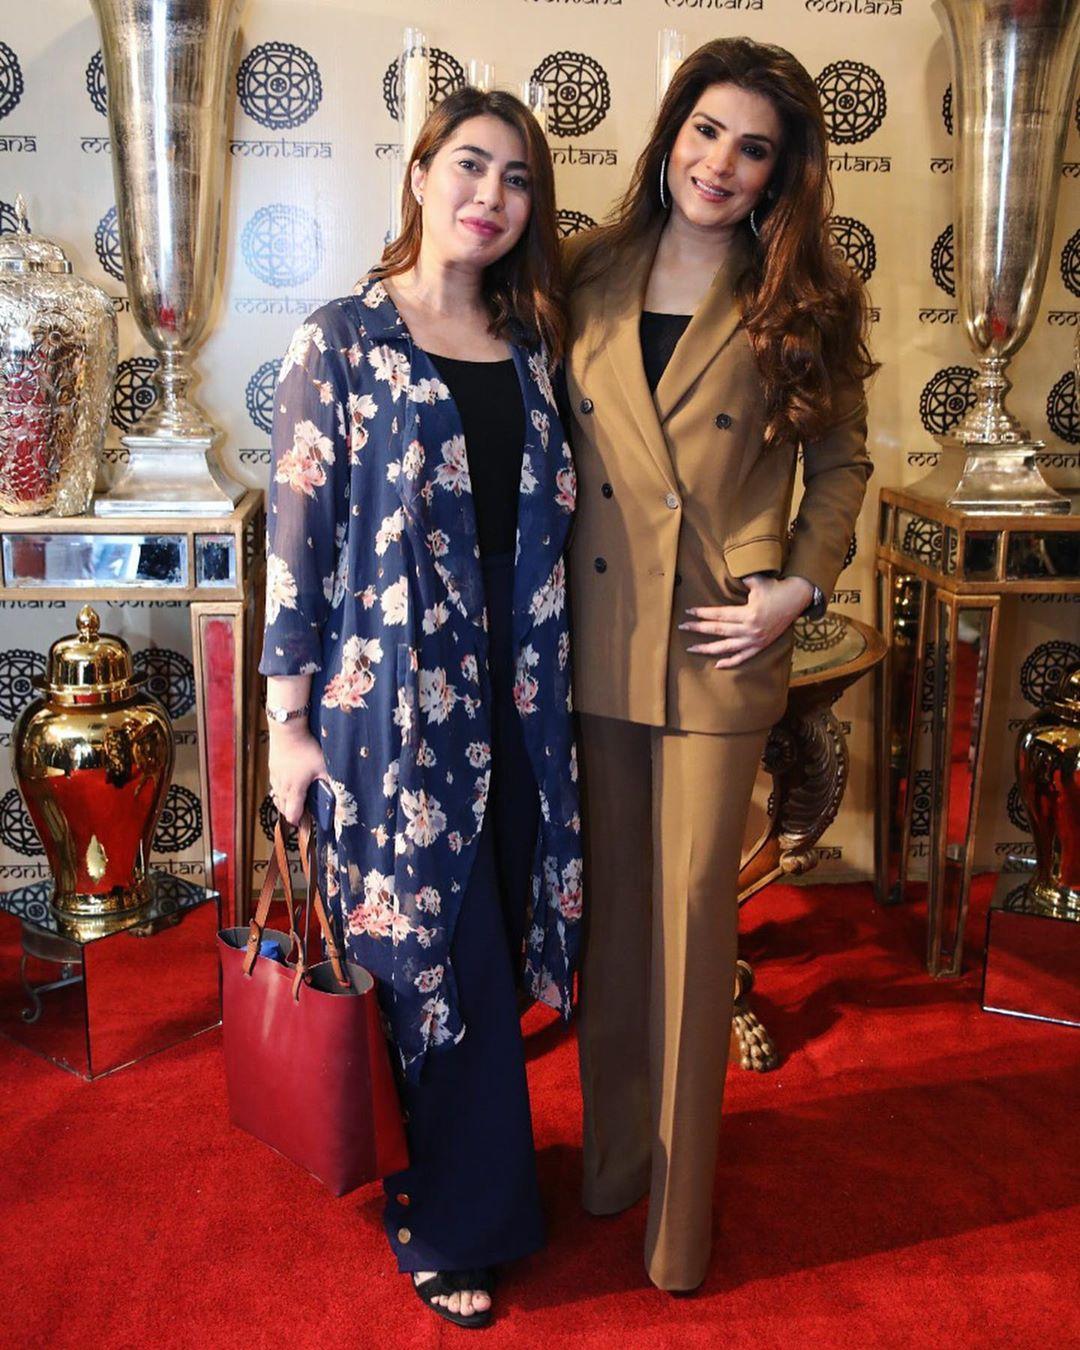 Resham Pakistani Actress Celebrate Birthday Party with Friends (5)